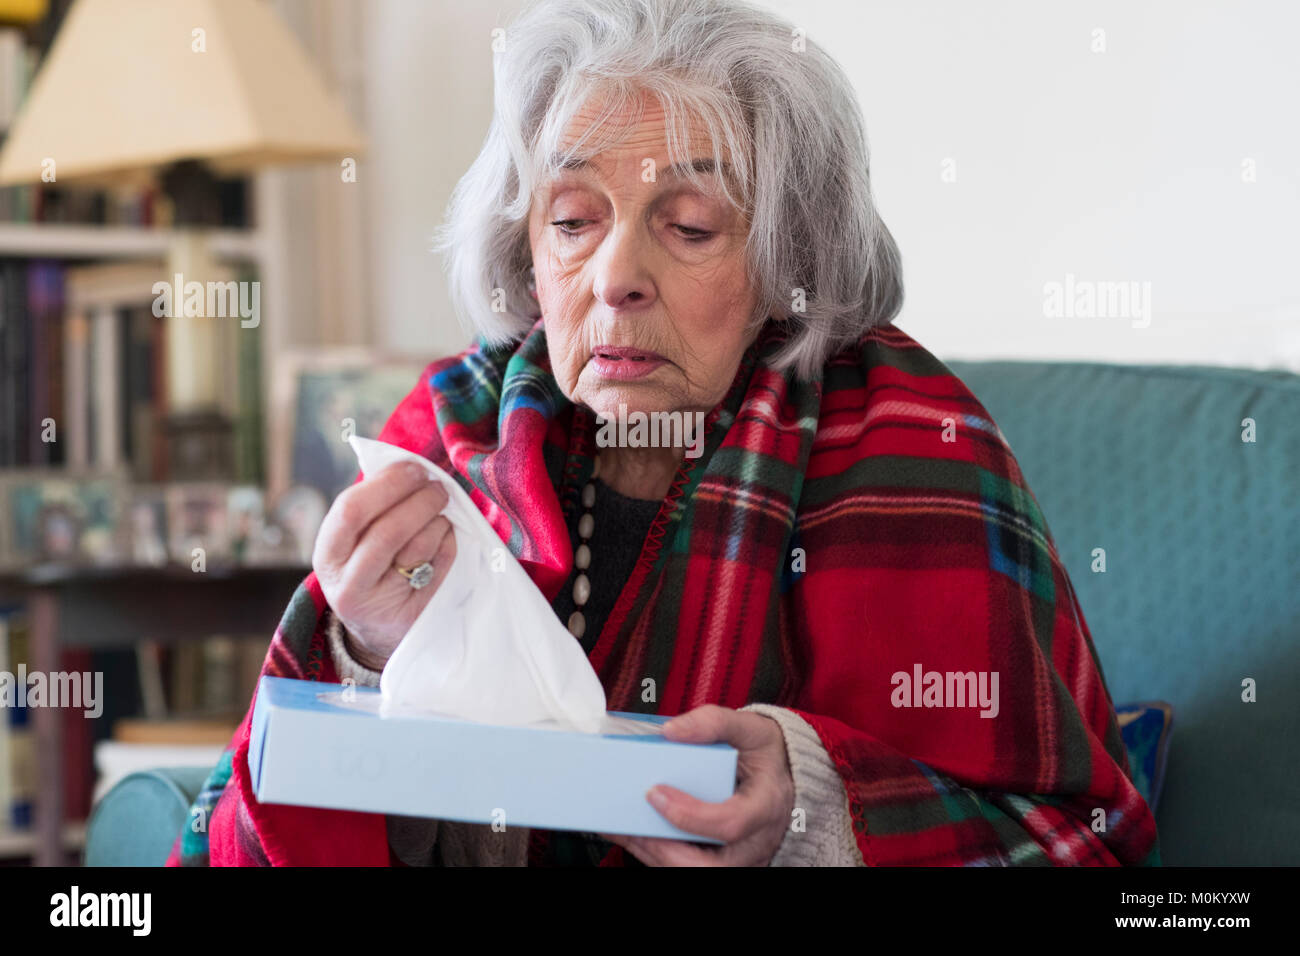 Ältere Frau zu Hause mit Grippe leiden Stockbild